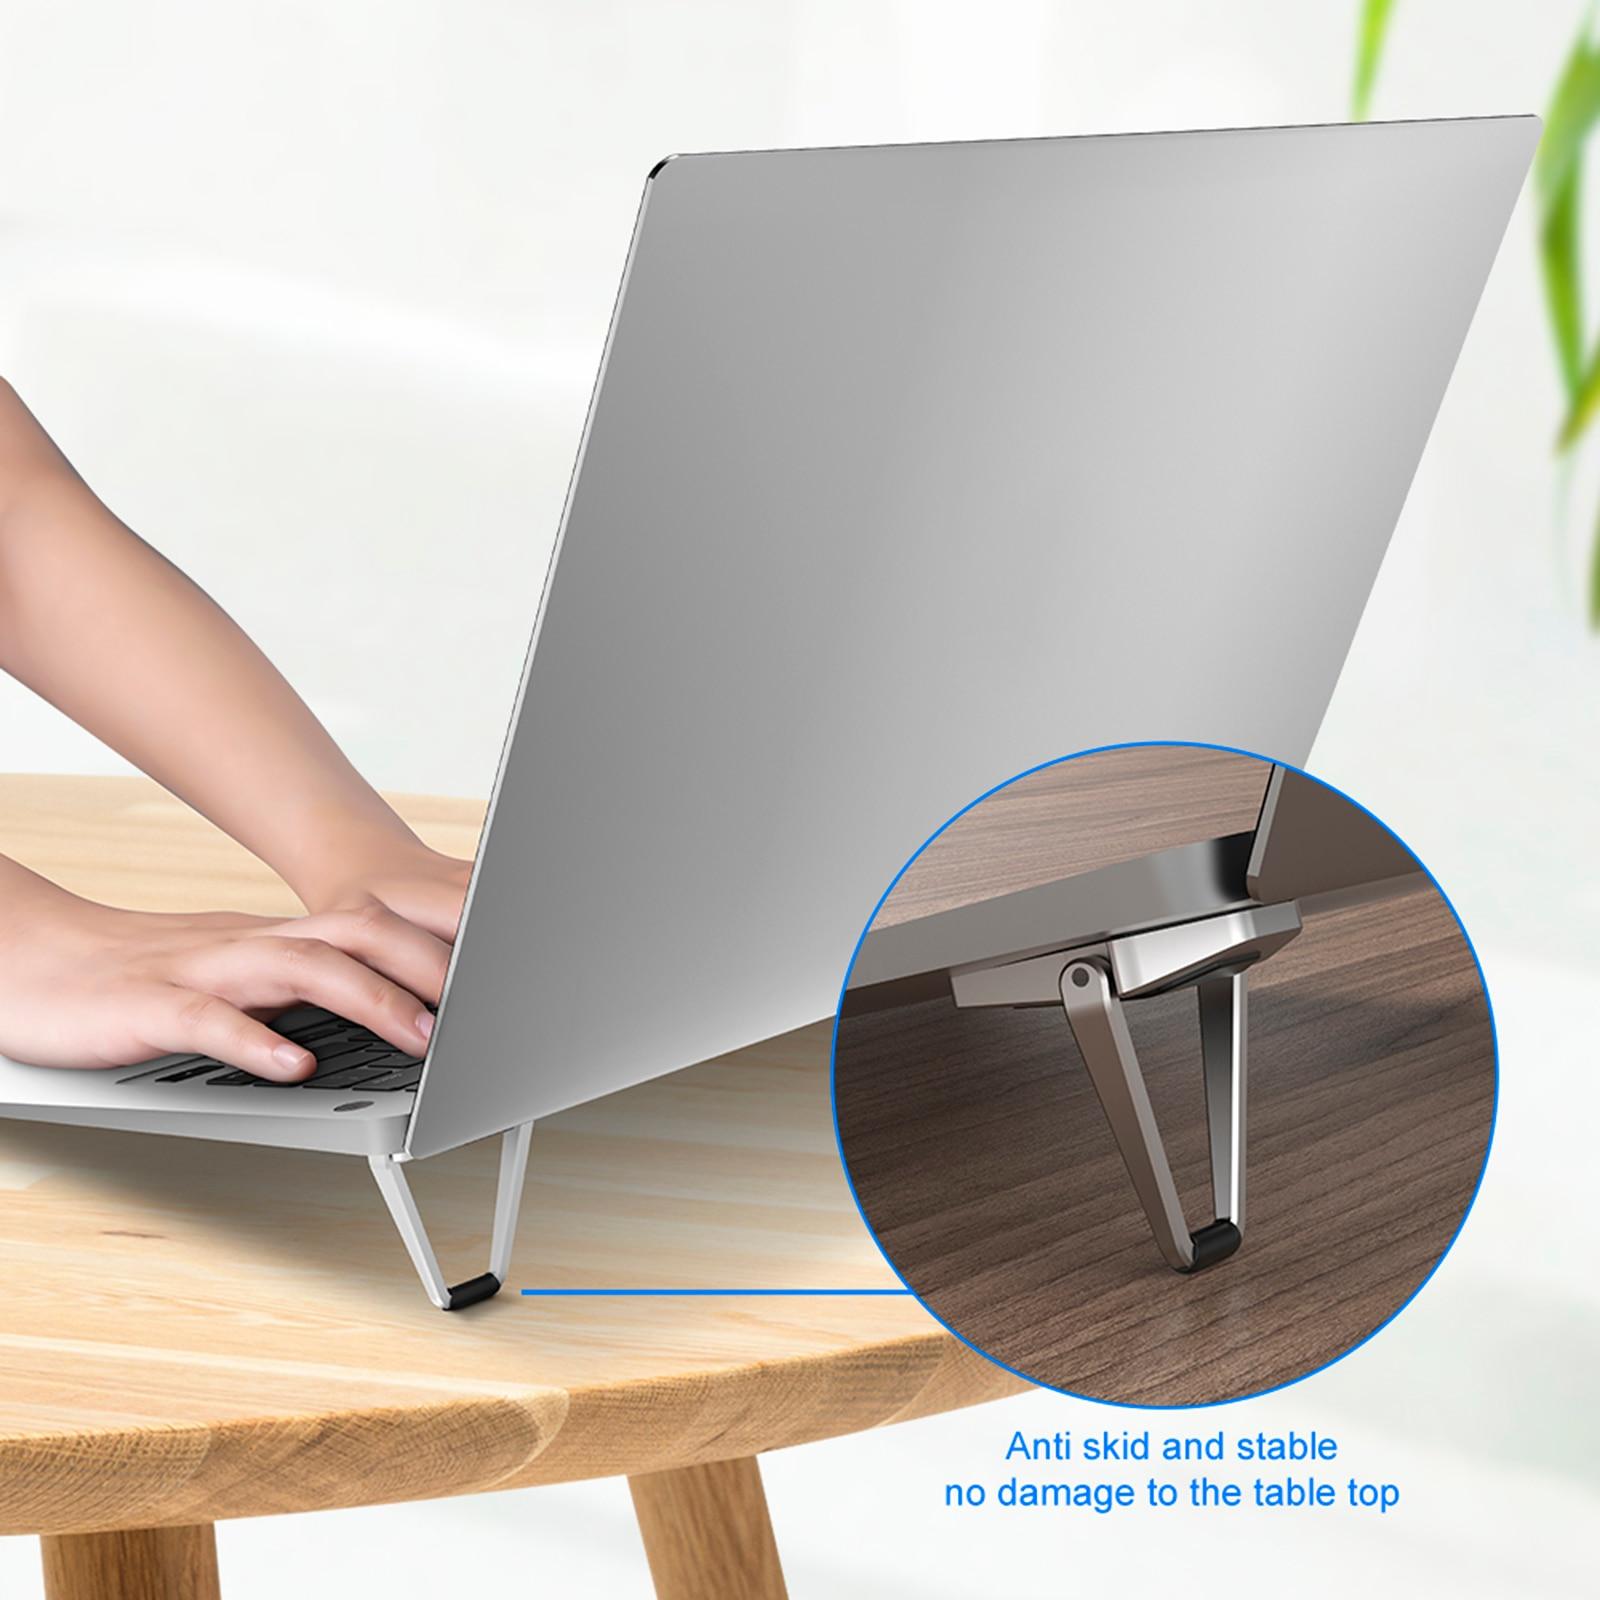 Invisable Zinc Alloy Laptop Stand For Pro Notebook Foldable Angel Adjustable Laptop Holder For Macbook Notebook Laptop